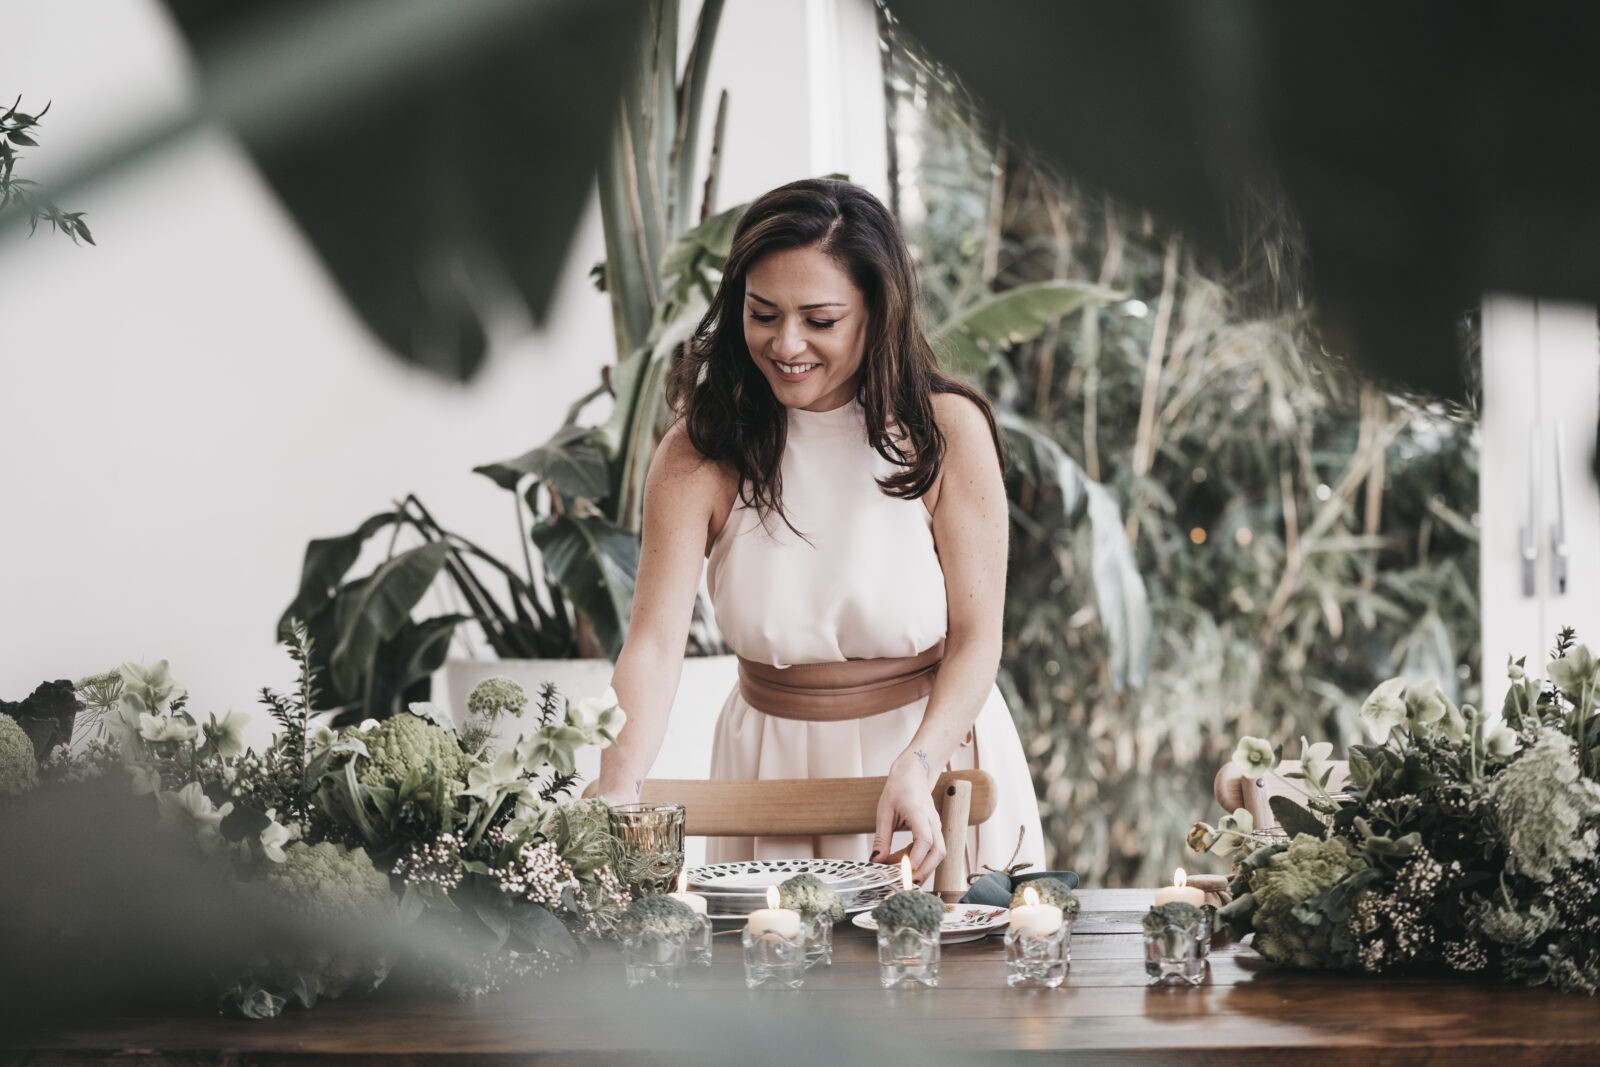 Wedding 0.0 by Sara Fiorito